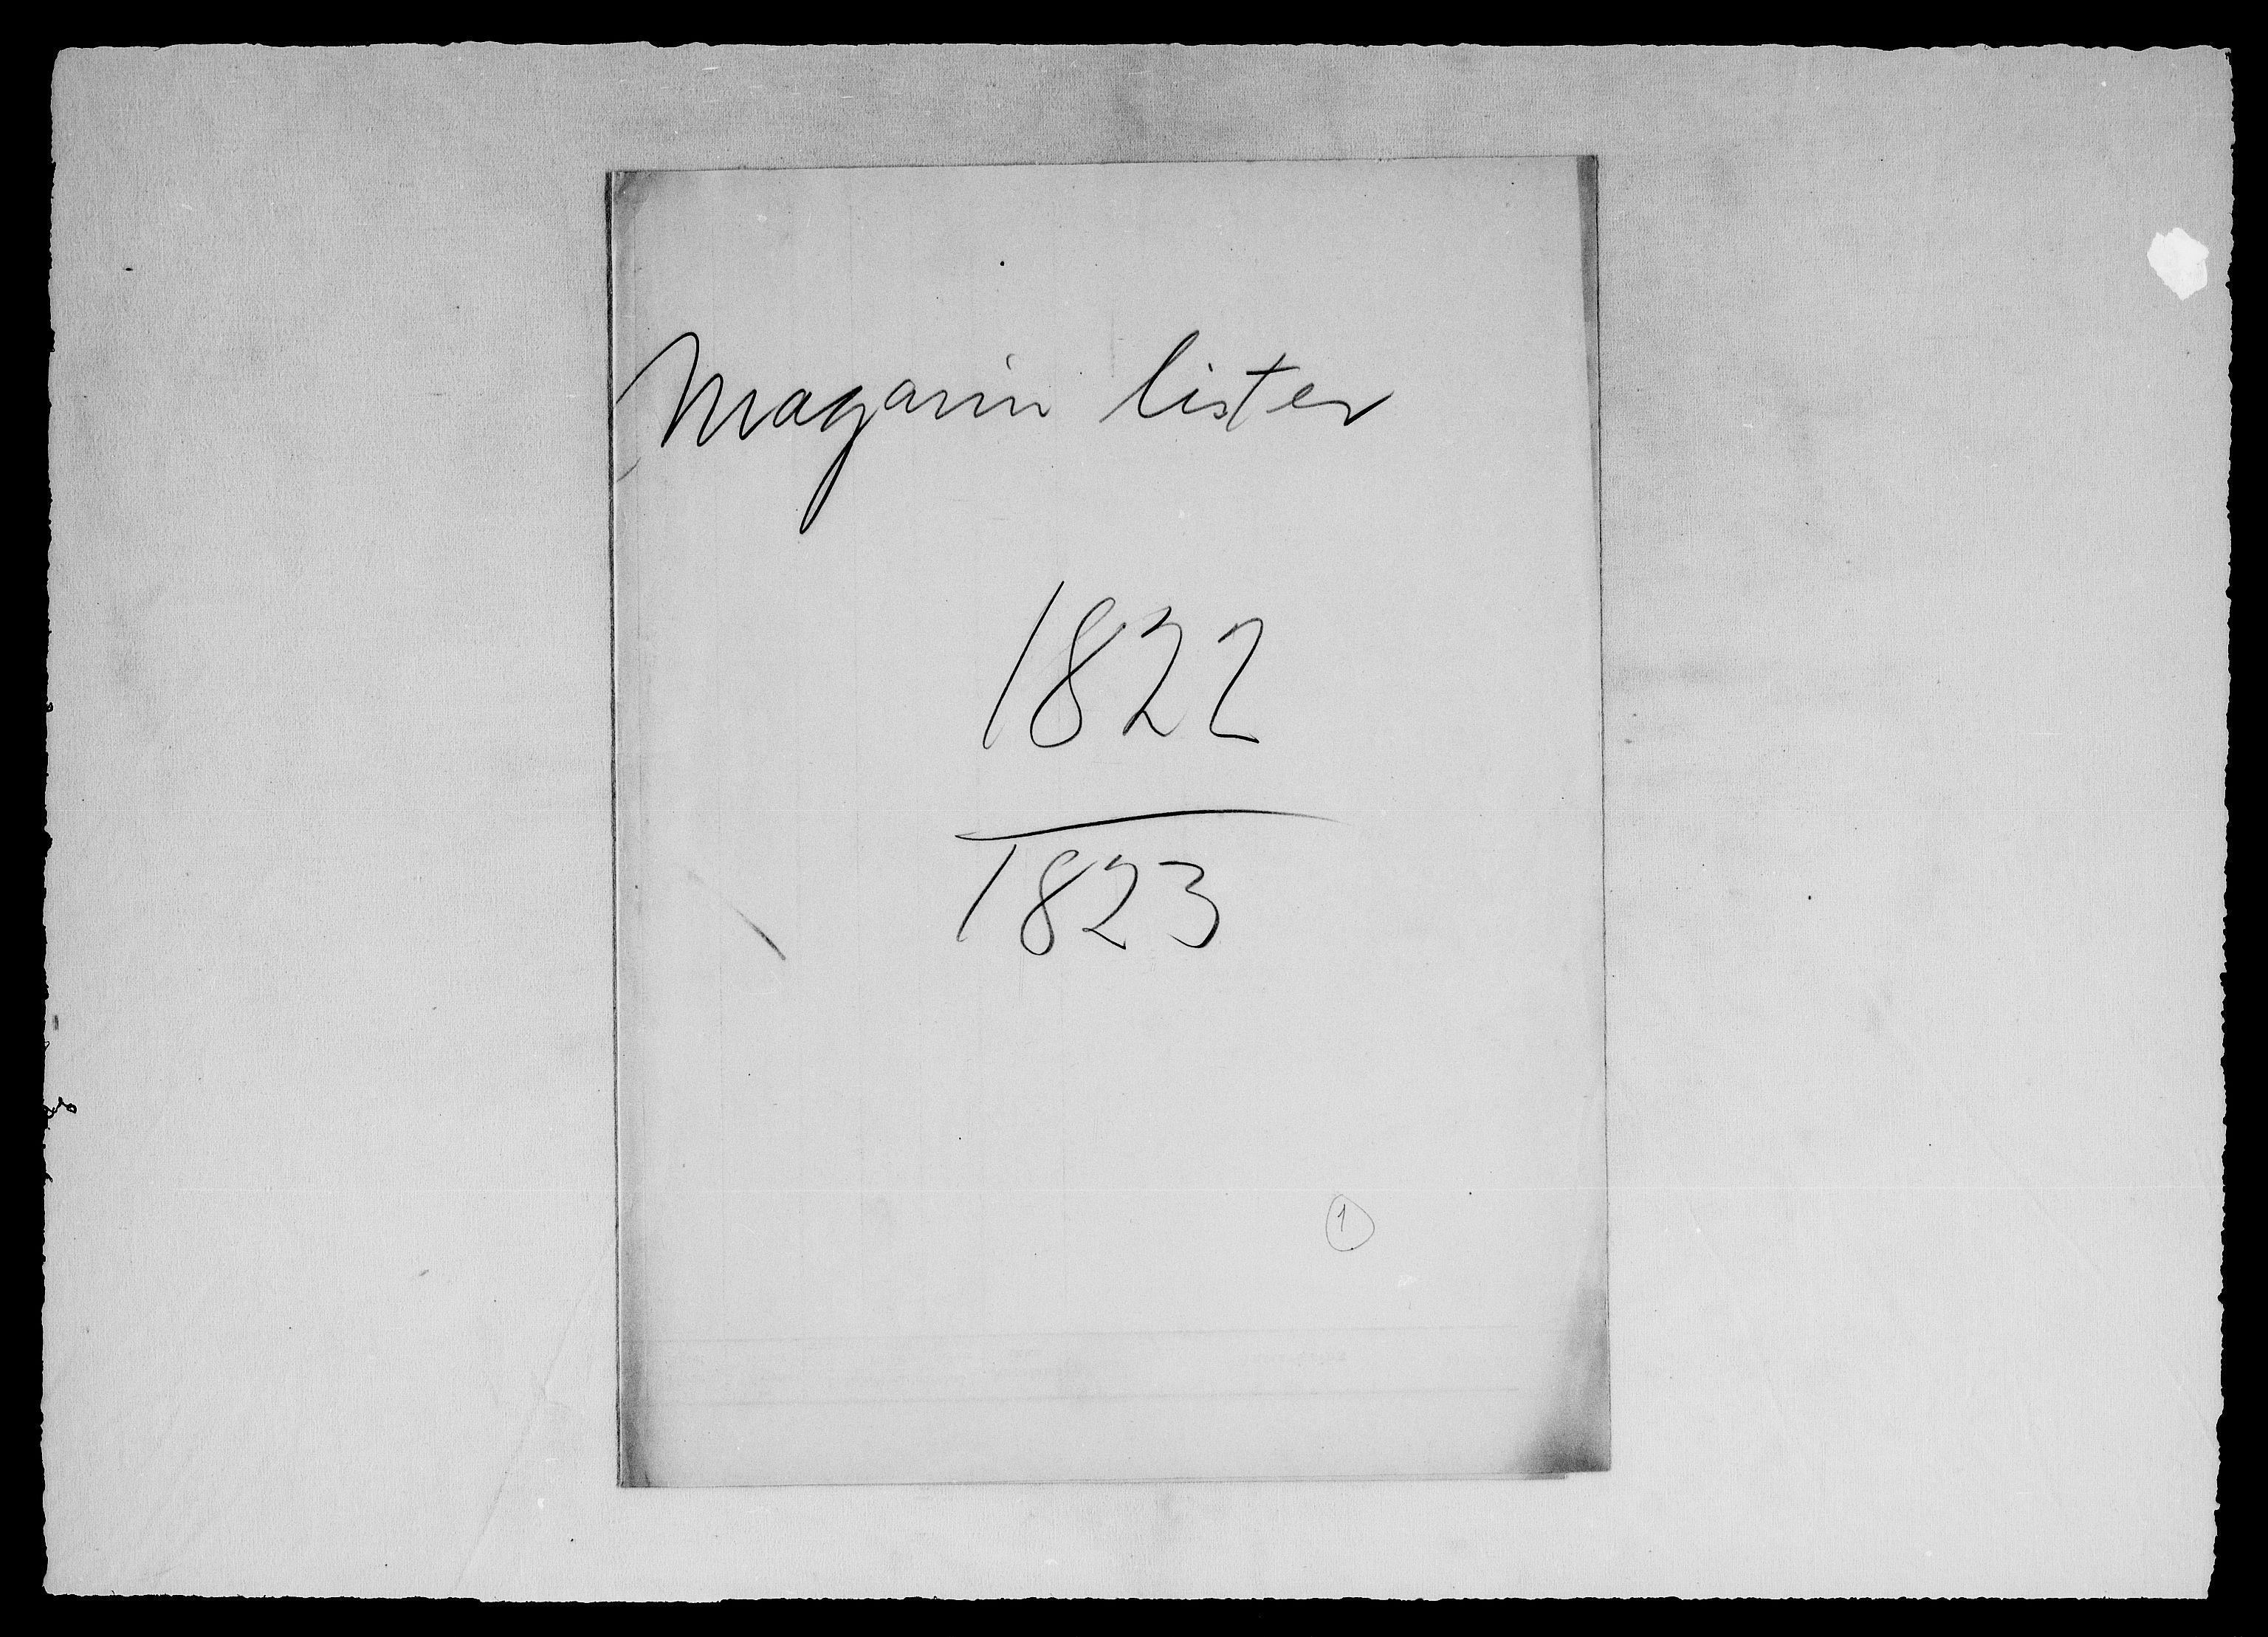 RA, Modums Blaafarveværk, G/Gd/Gdd/L0302, 1822-1831, s. 2